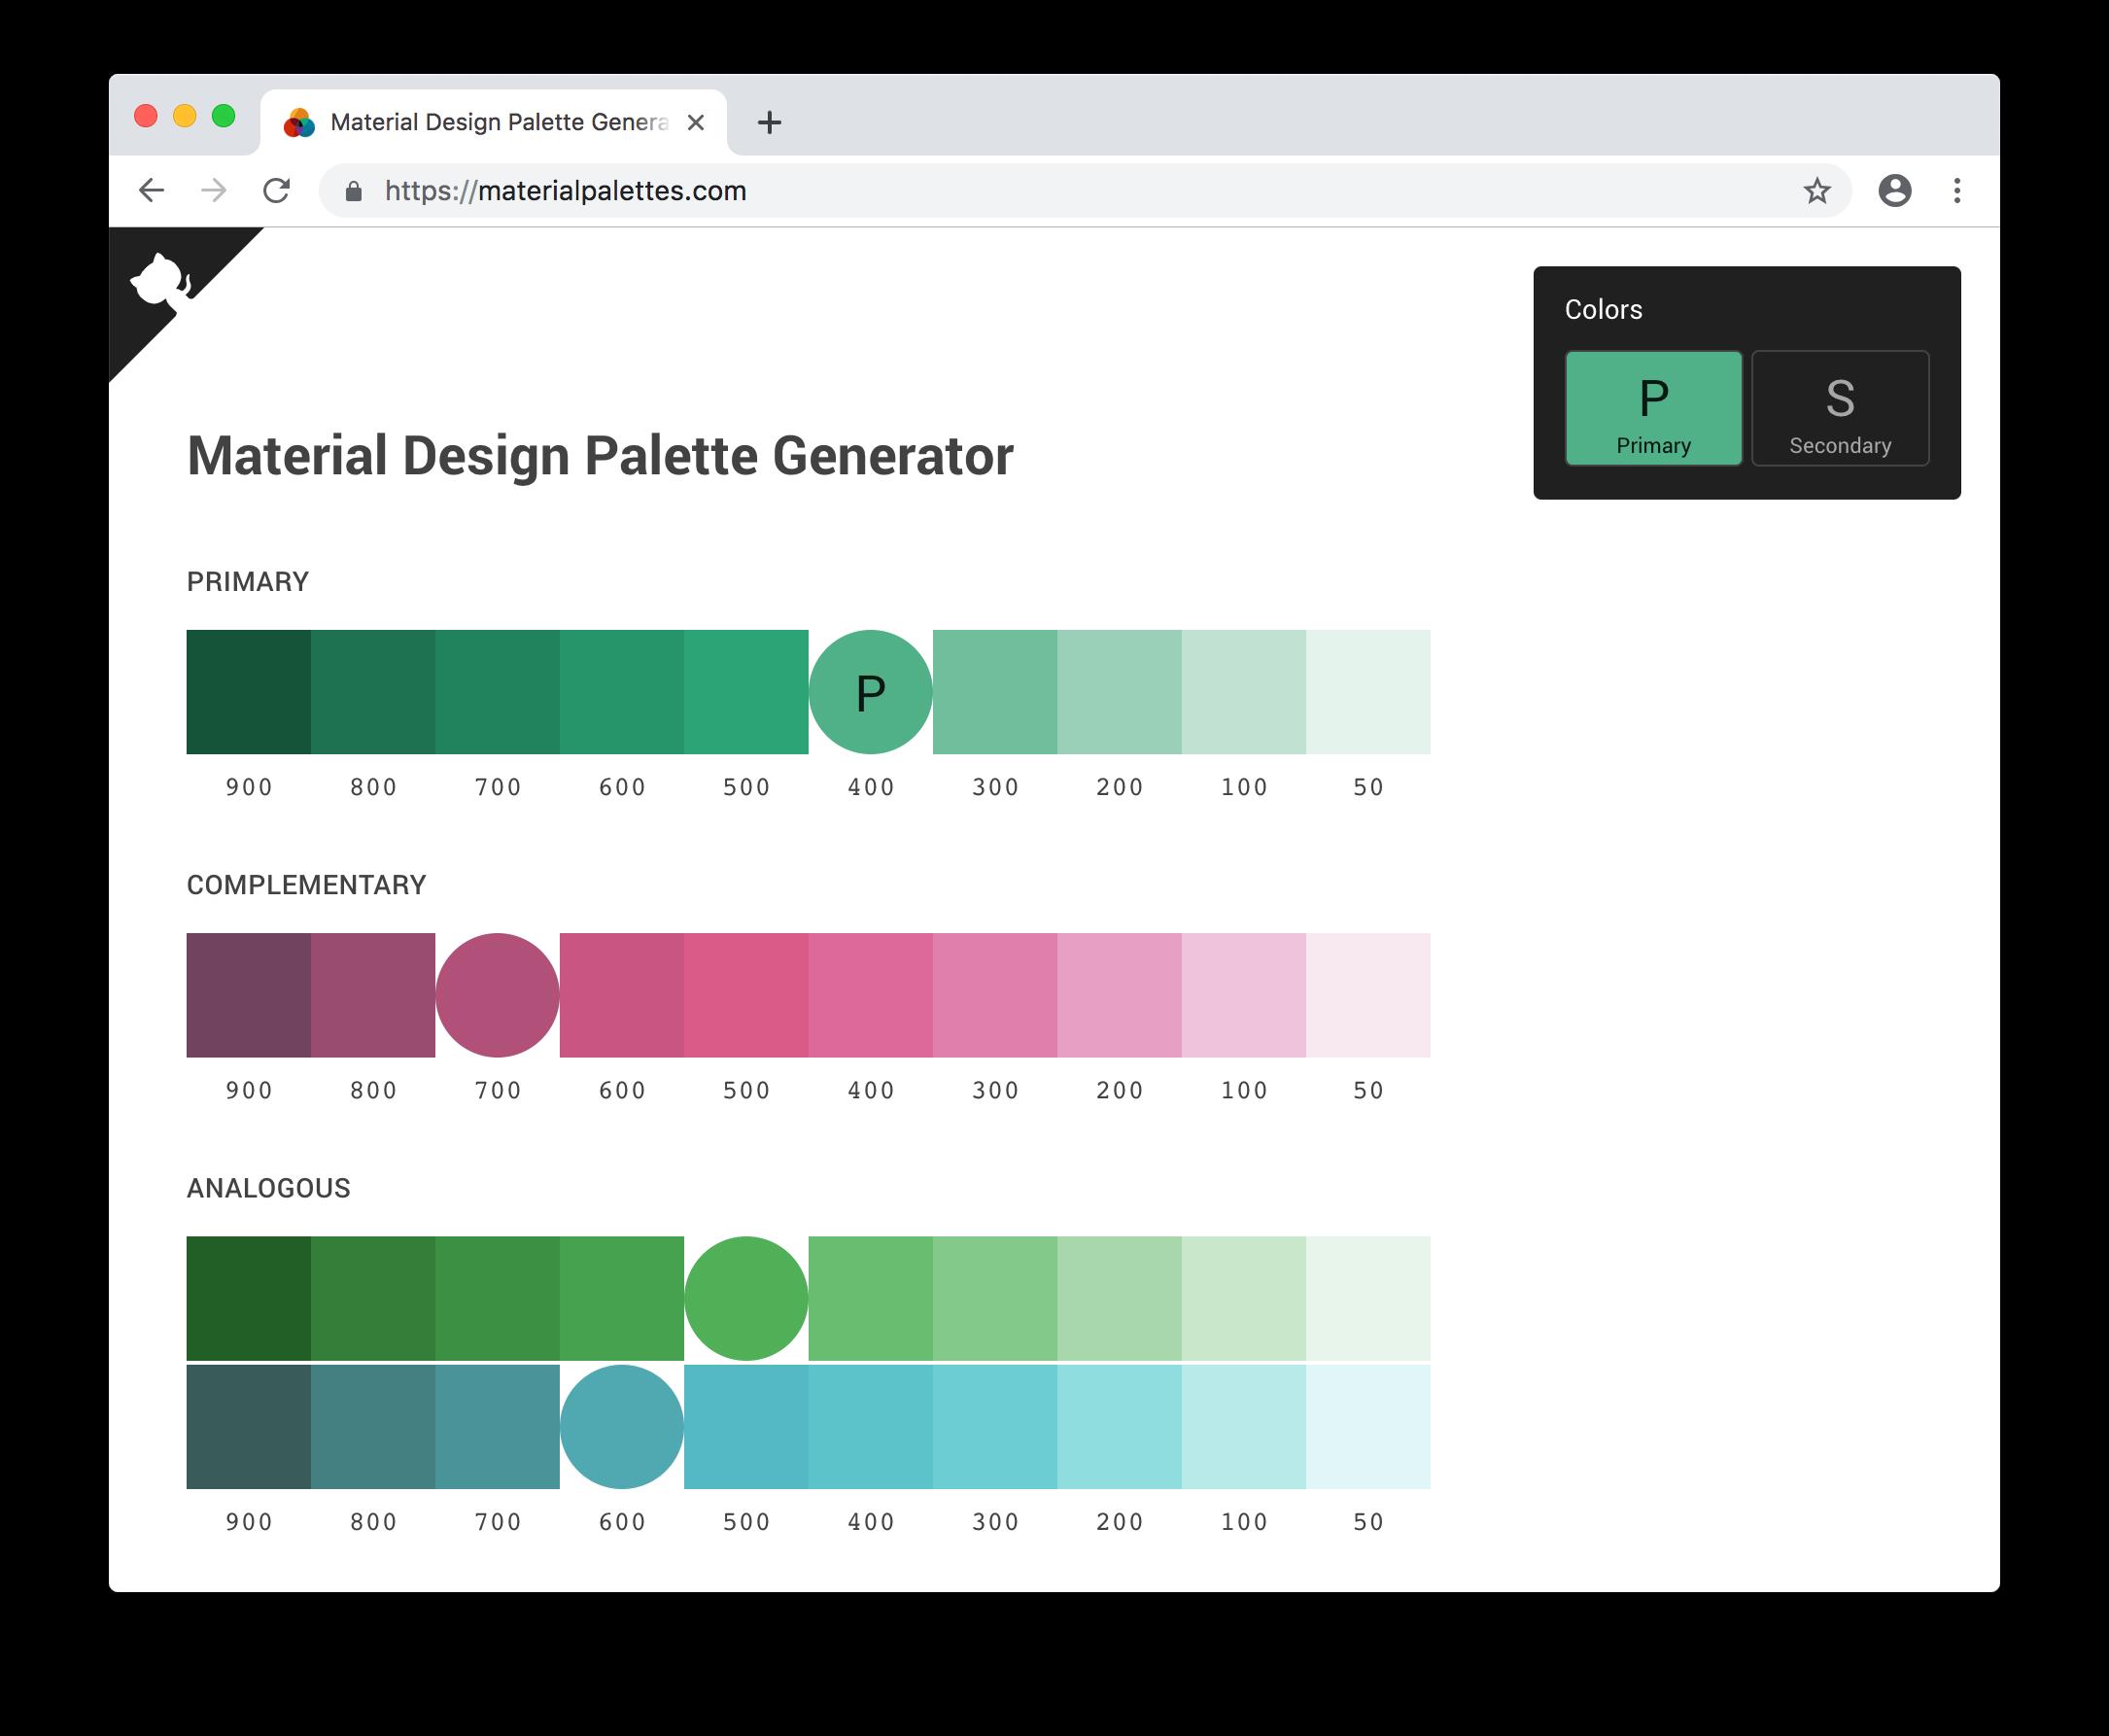 Material Design Palette Generator - Get perfect Material Design palettes from any hex color